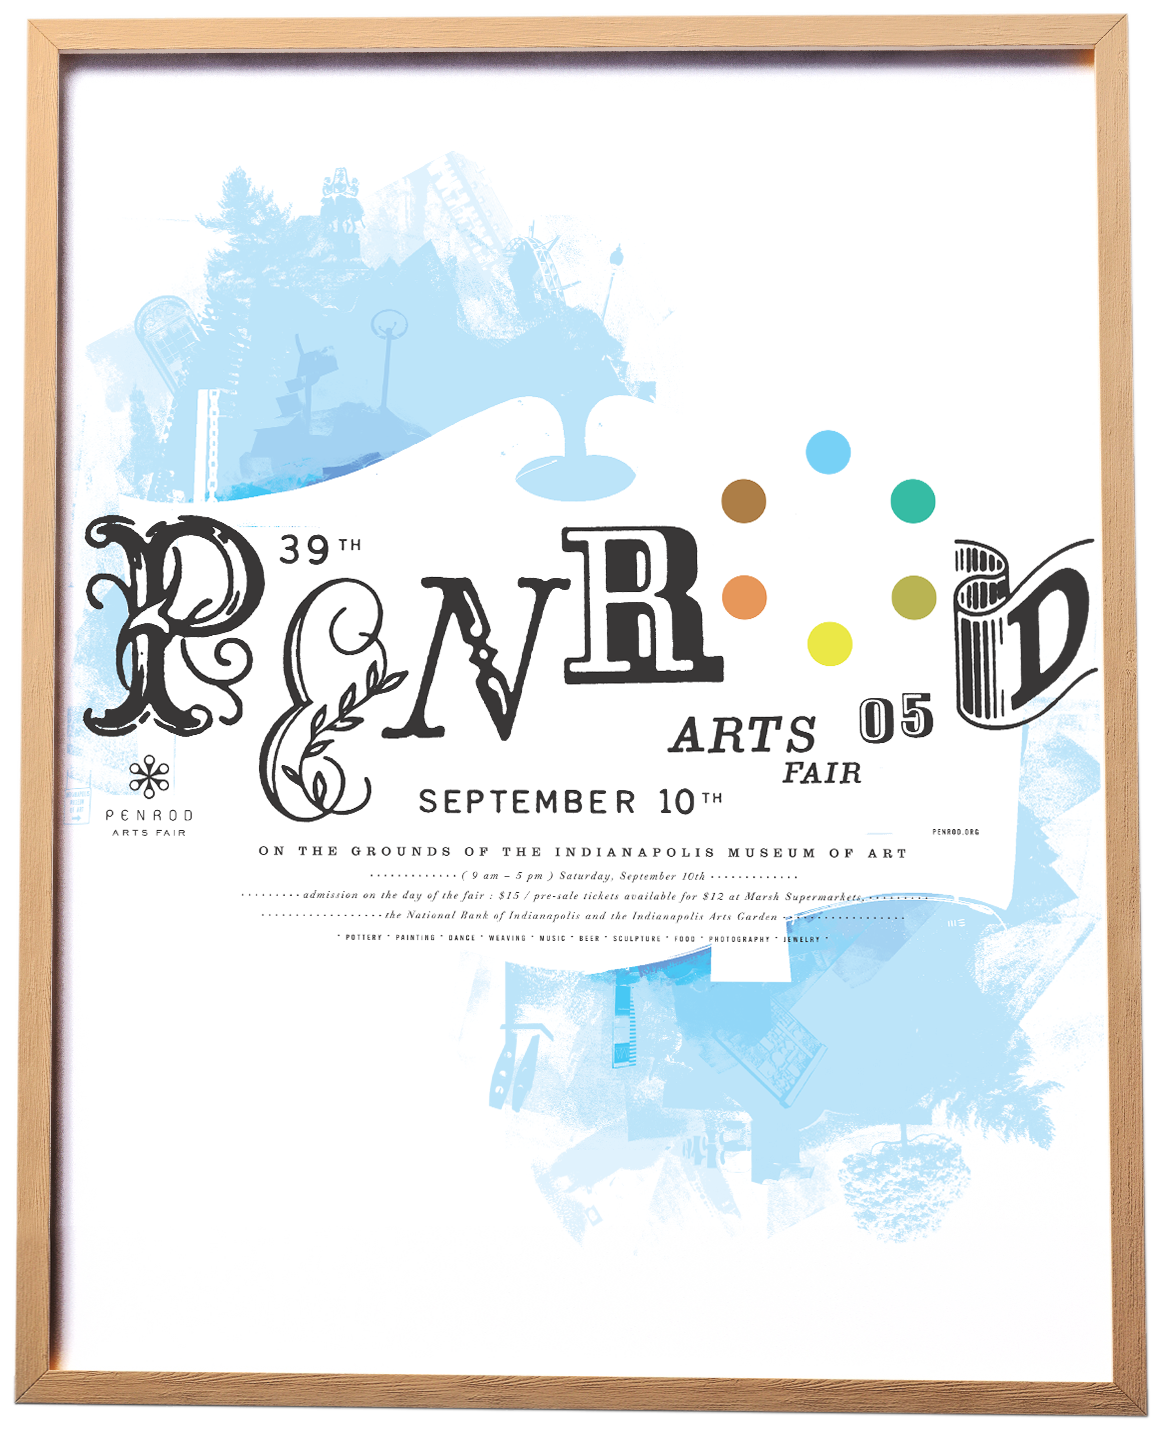 Penrod Arts Fair Poster 2005 : Funnel.tv | Eric Kass